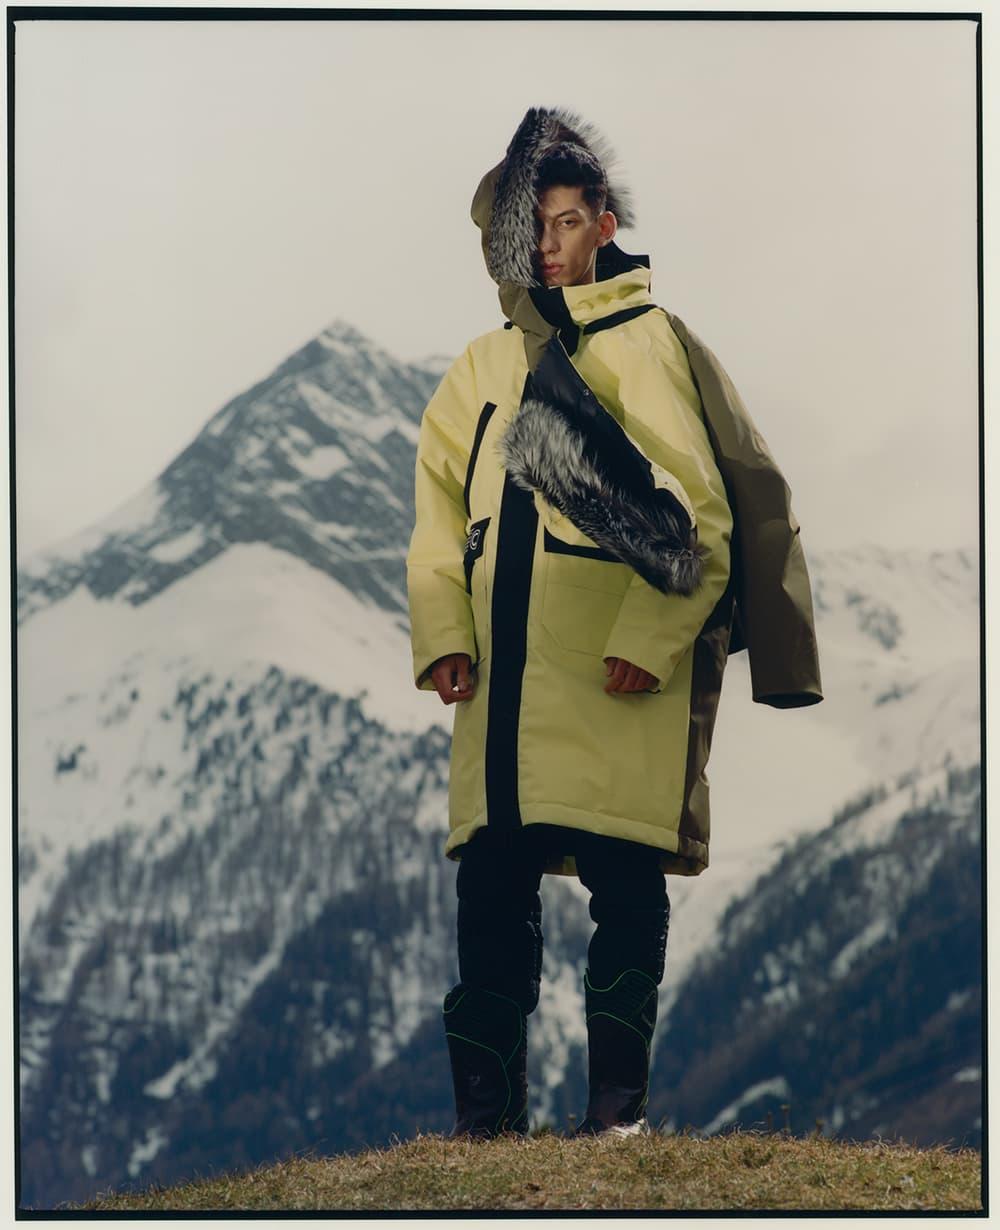 shayne oliver colmar italian heritage alpine mountain label experimentation age